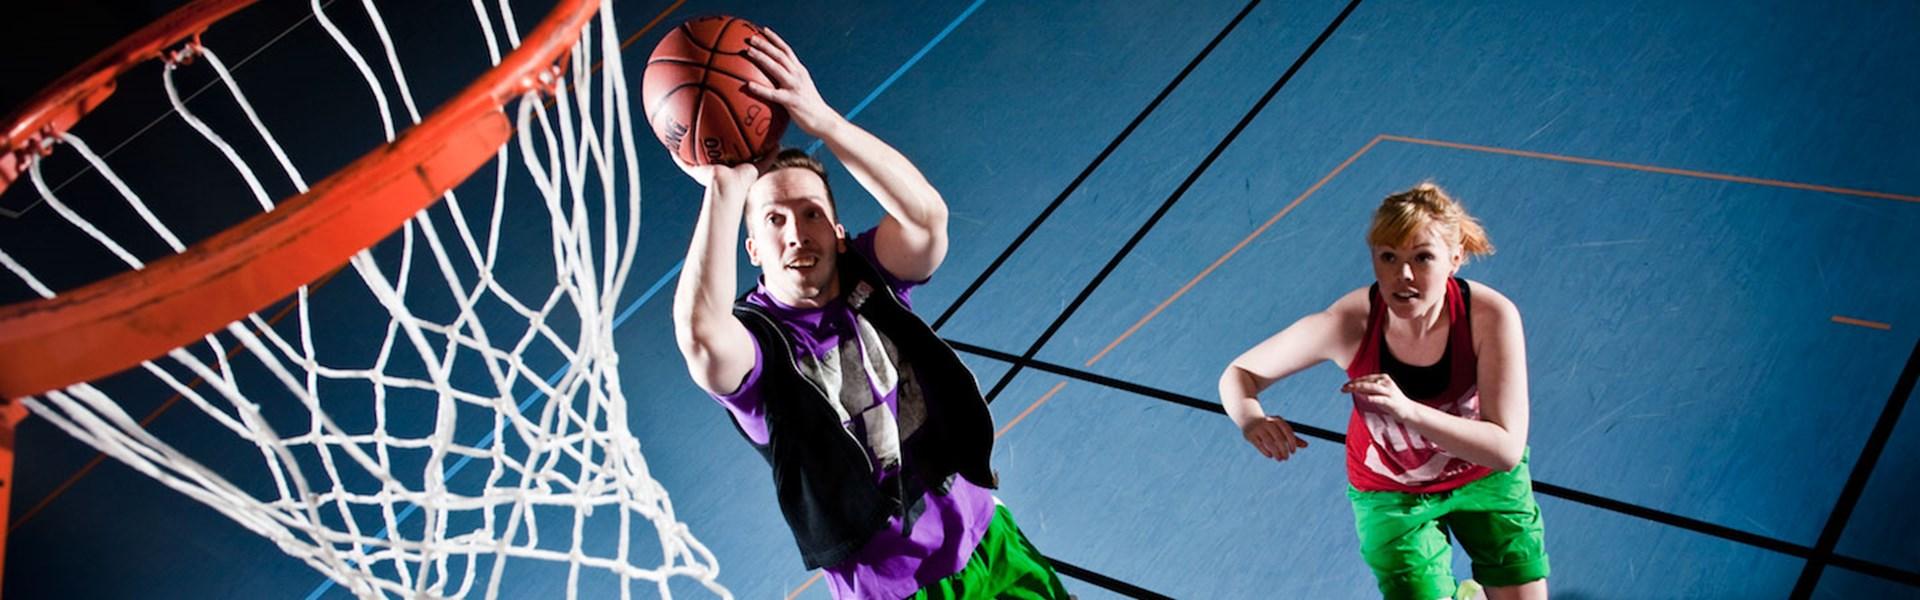 Campus1477 gym i Uppsala - Basket 78896d2f9f8c8